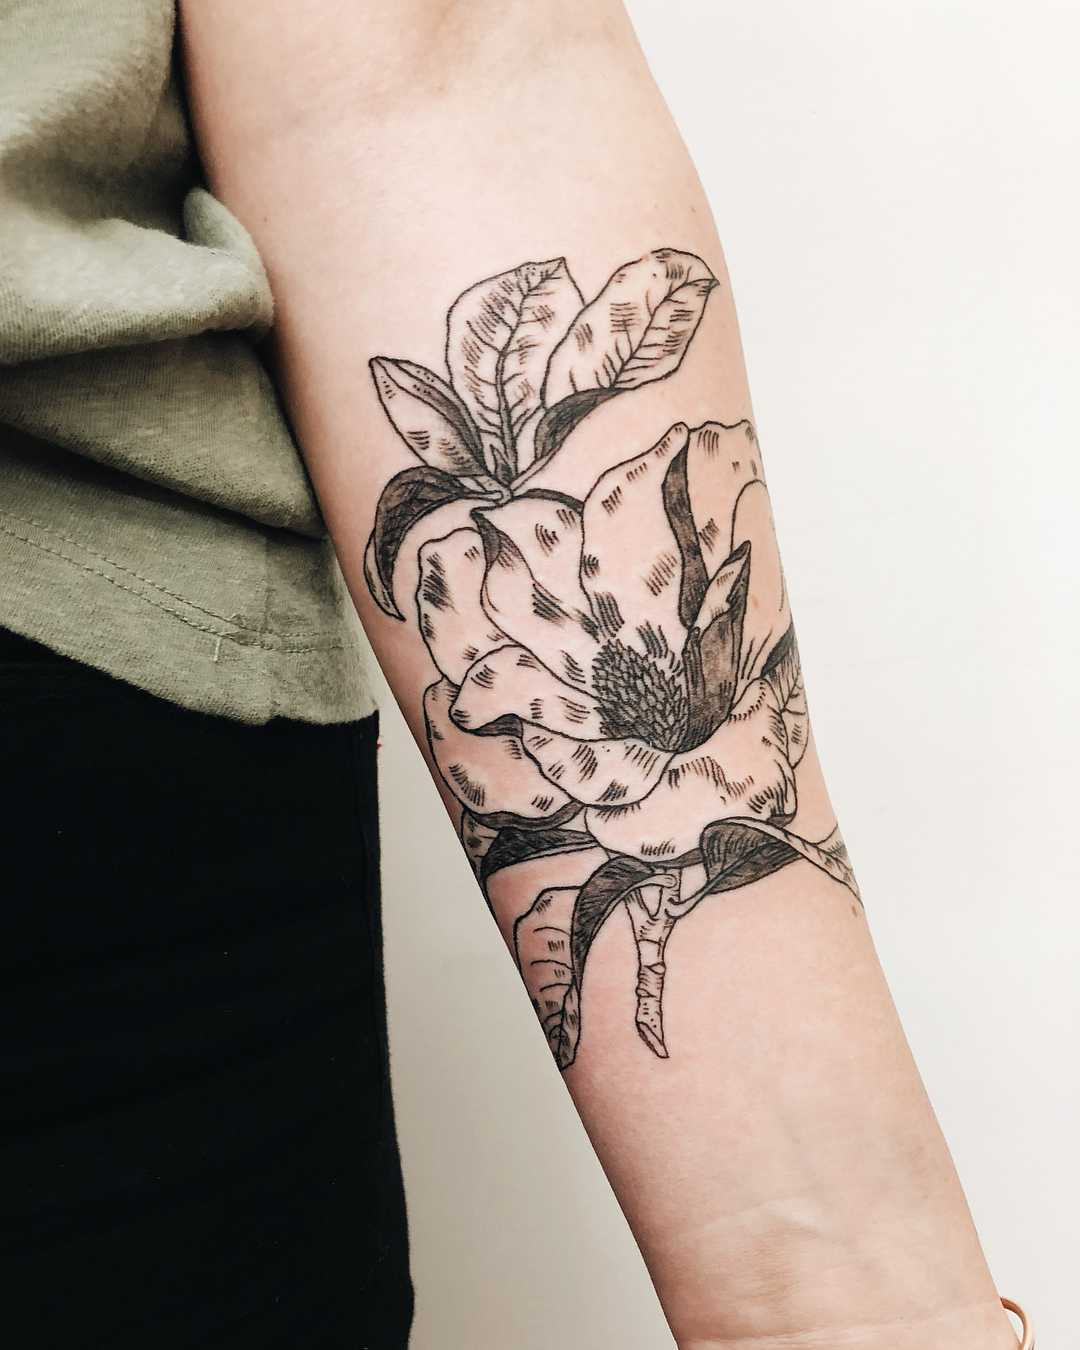 Magnolia bloom tattoo by Finley Jordan